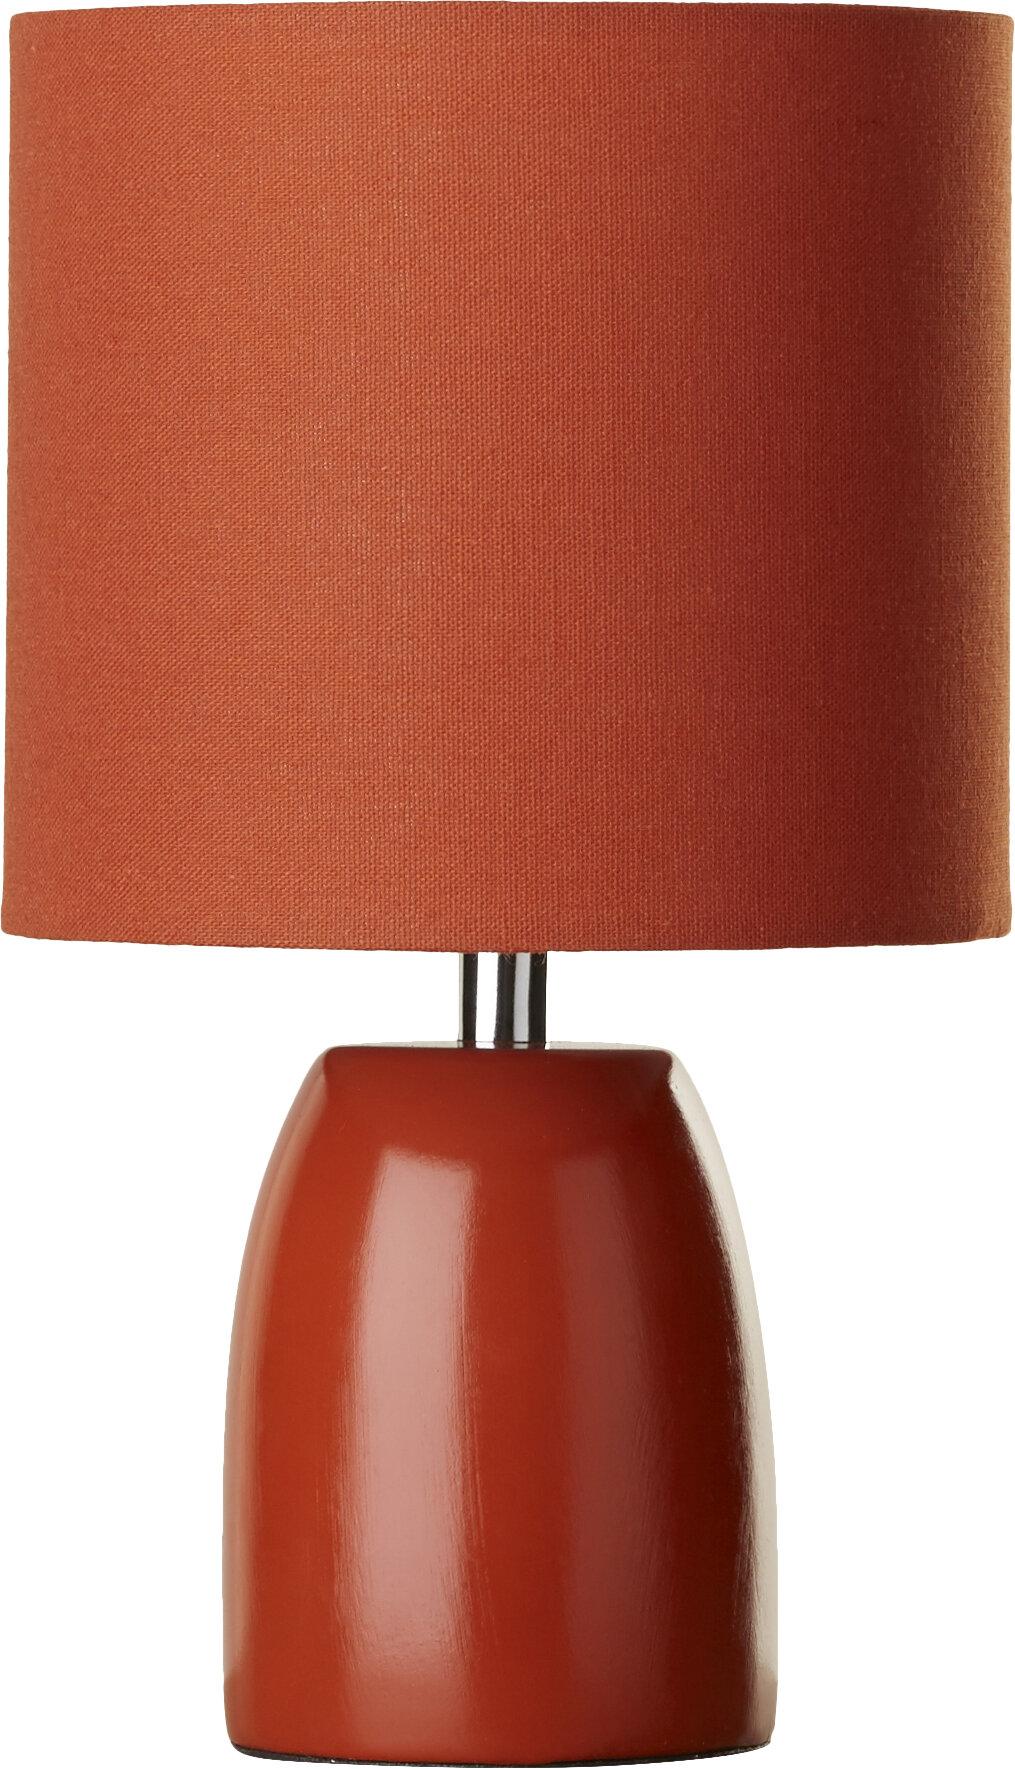 17 Stories Dewhirst 26cm Table Lamp Reviews Wayfair Co Uk